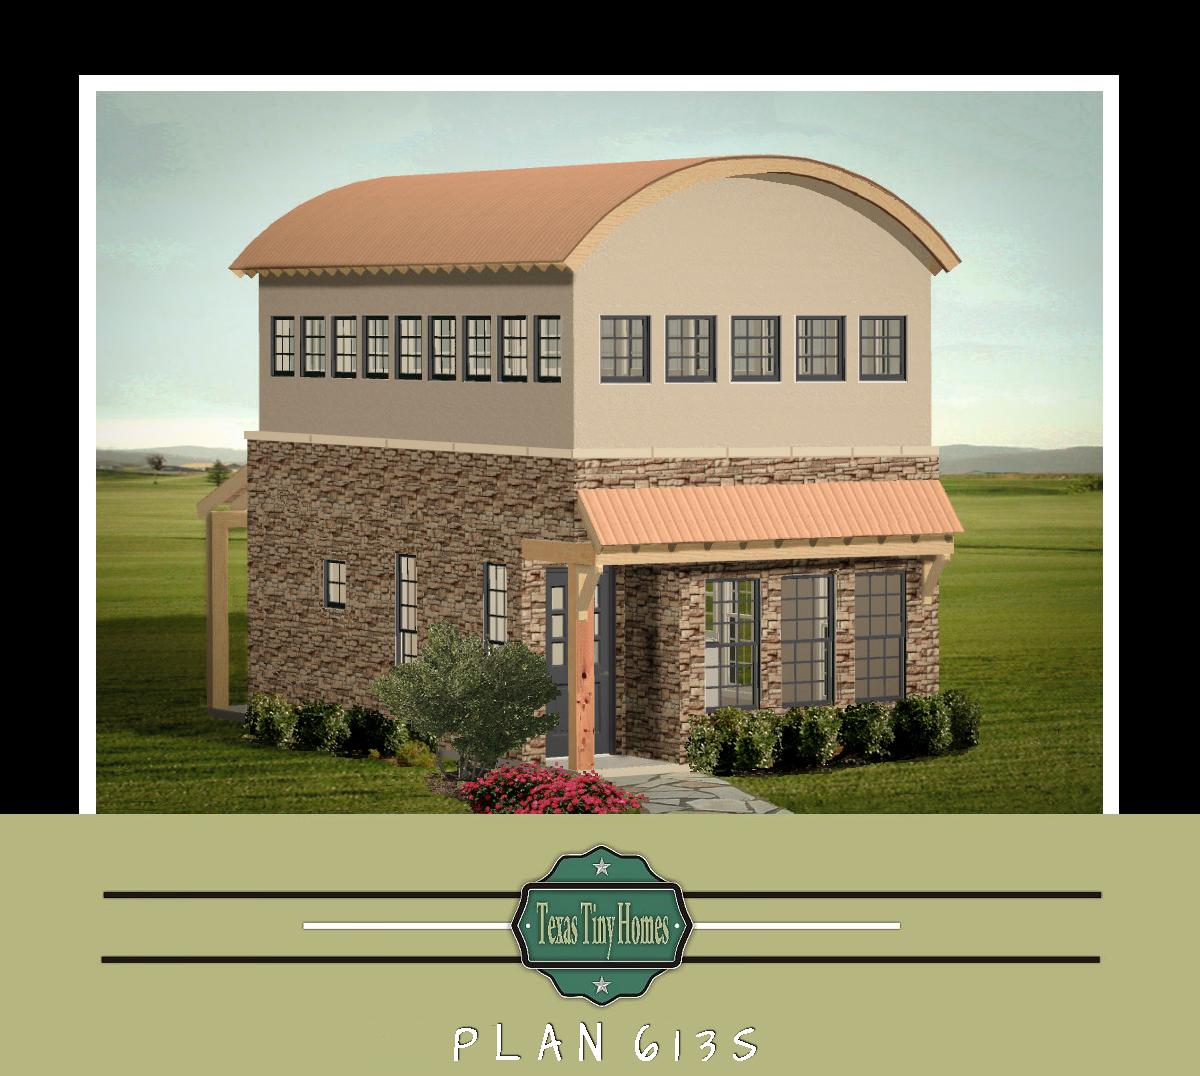 Tiny House Plans, Small Home Plans, Micro Tiny Home Plans, Micro Home Plans, Tiny Home plans, Tiny Homes, Tiny Houses, Tiny House Builder, Tiny Homes Builder, small houses, small house plans